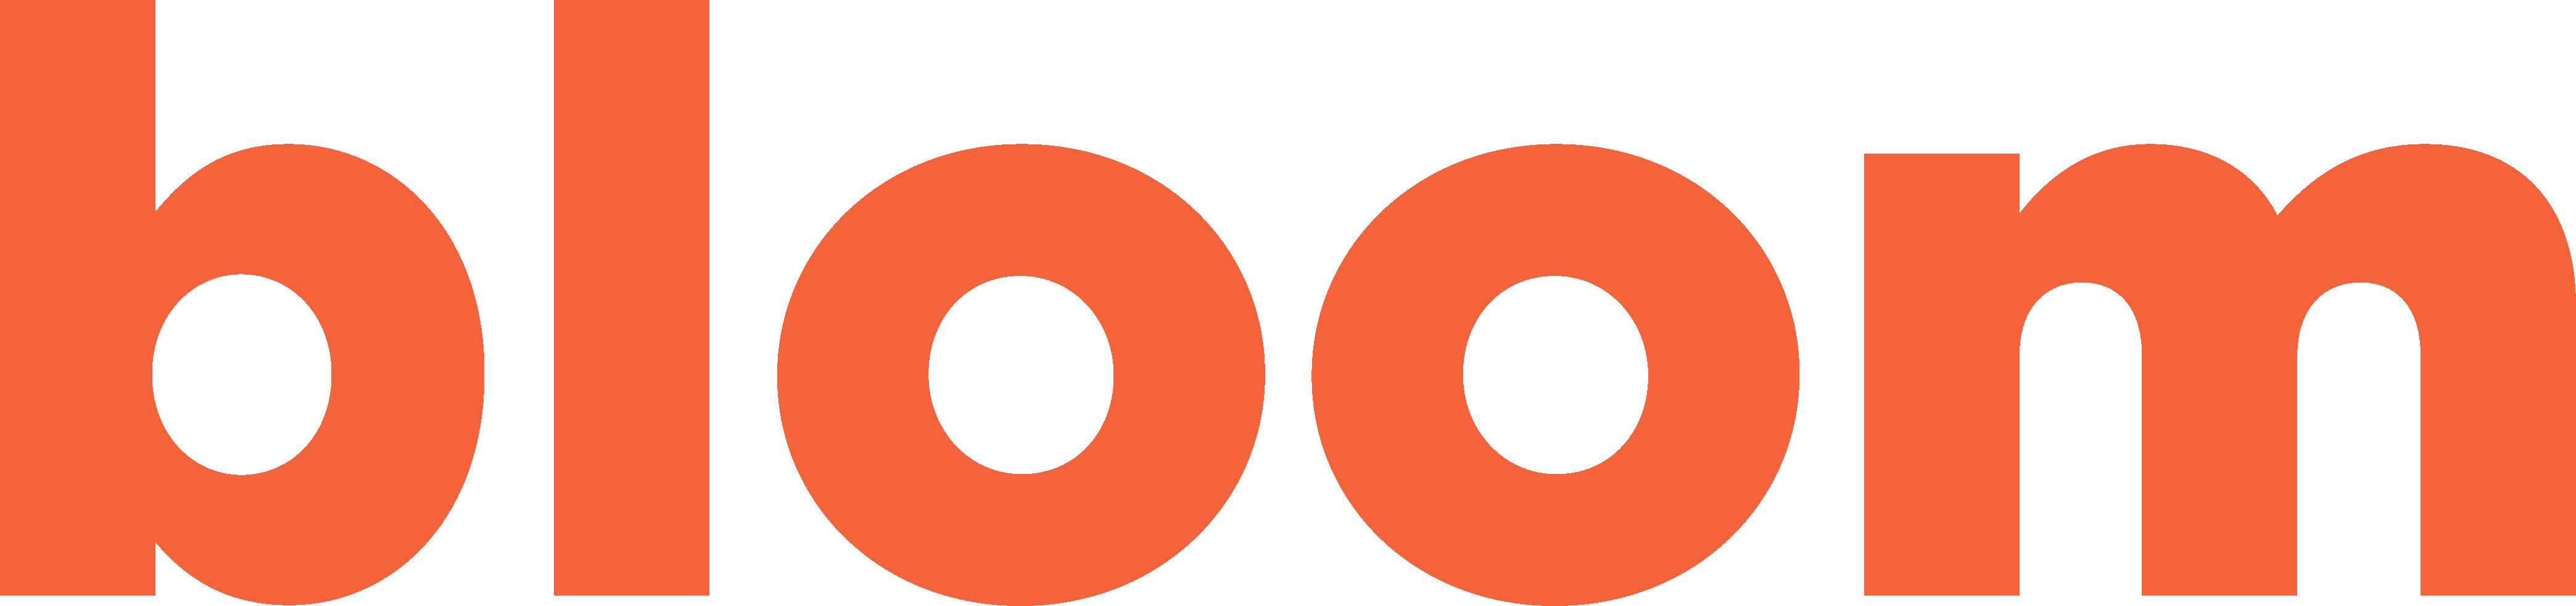 Bloom promo code